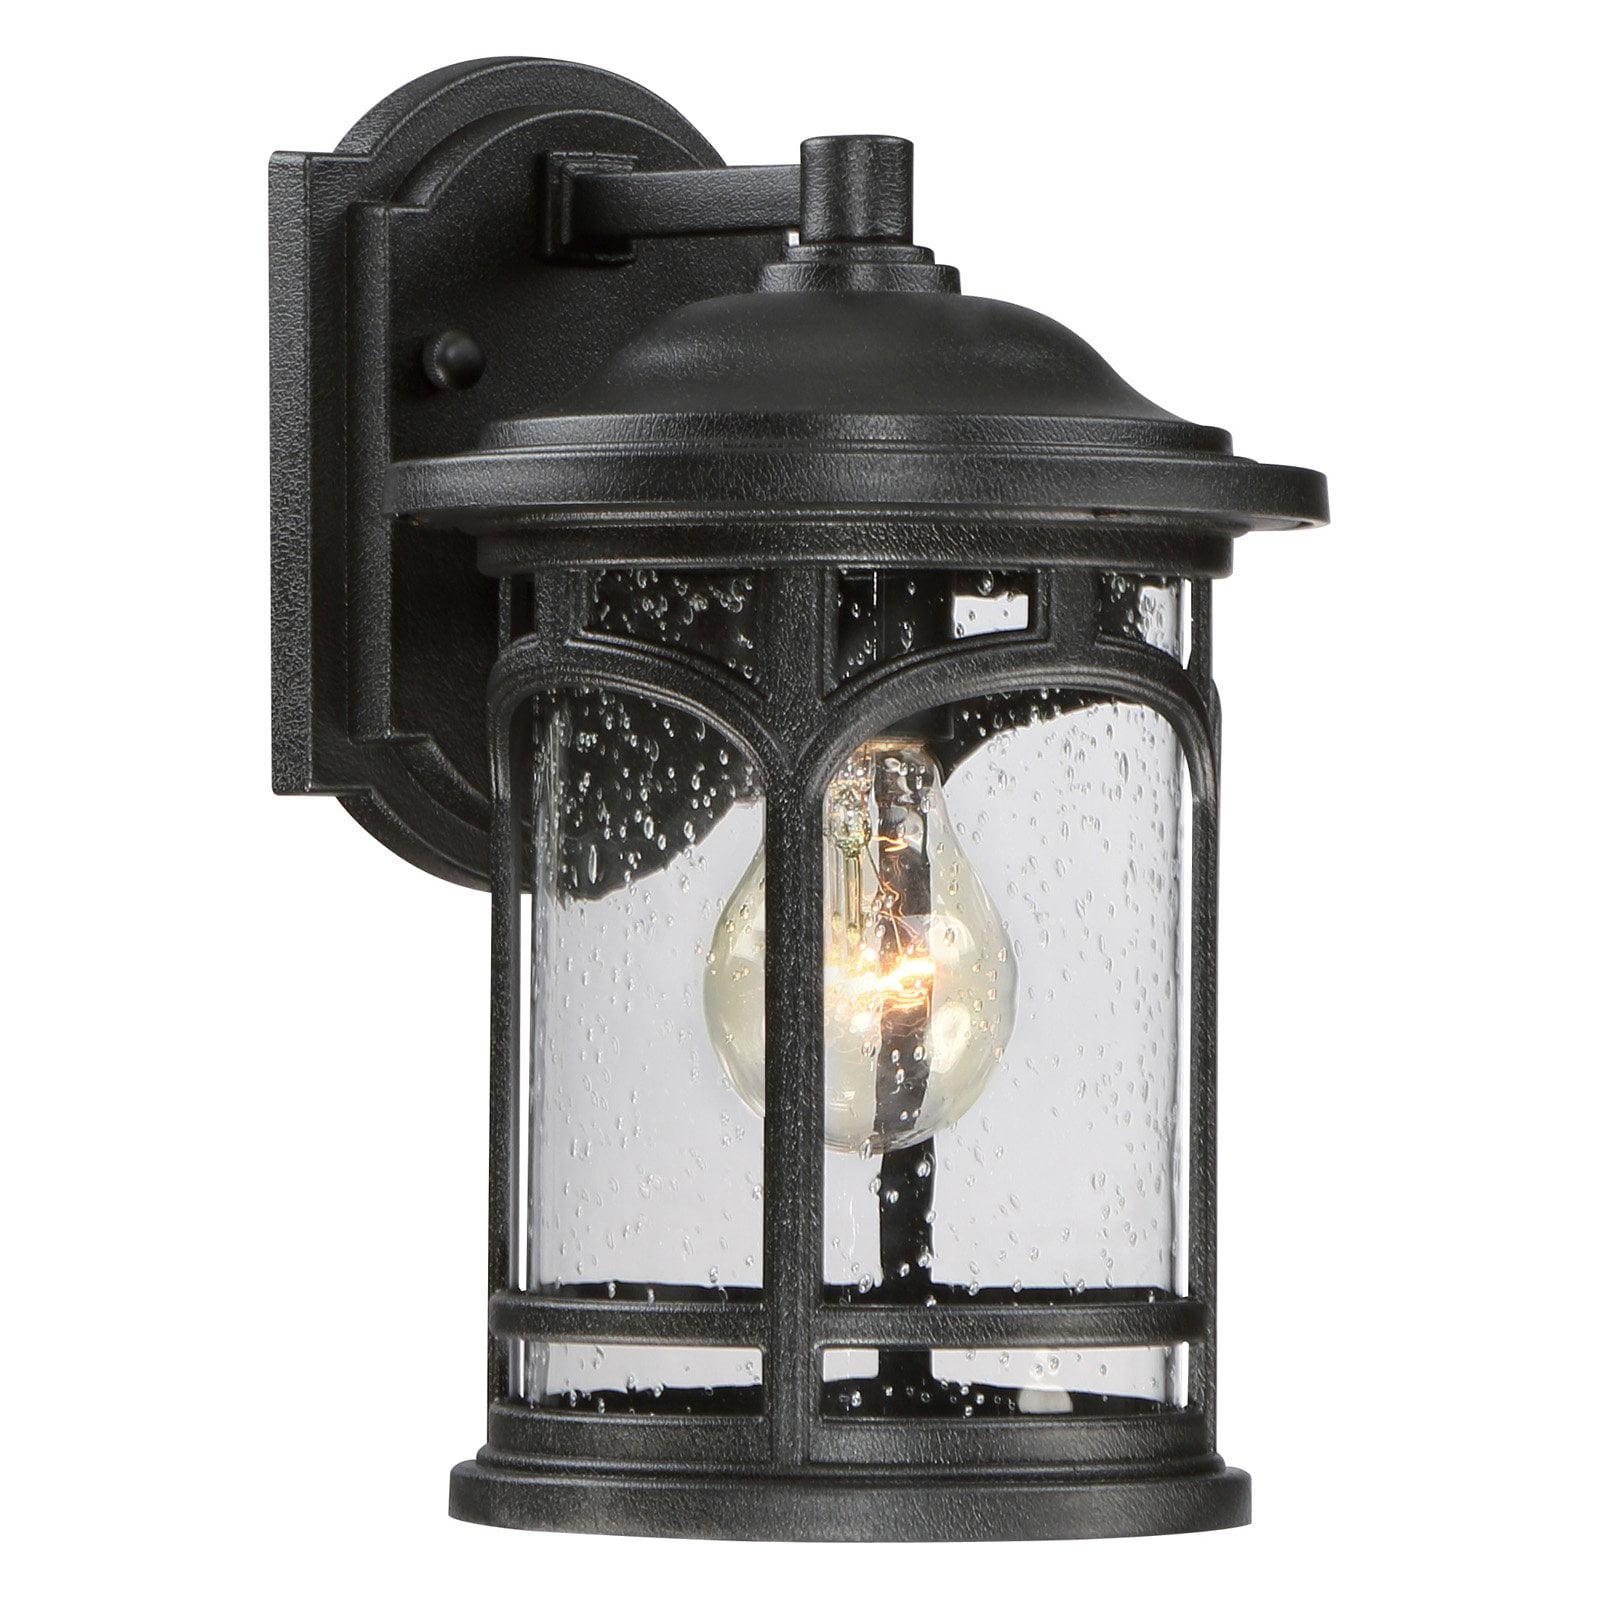 Quoizel Marblehead MBH84 Small Outdoor Wall Lantern